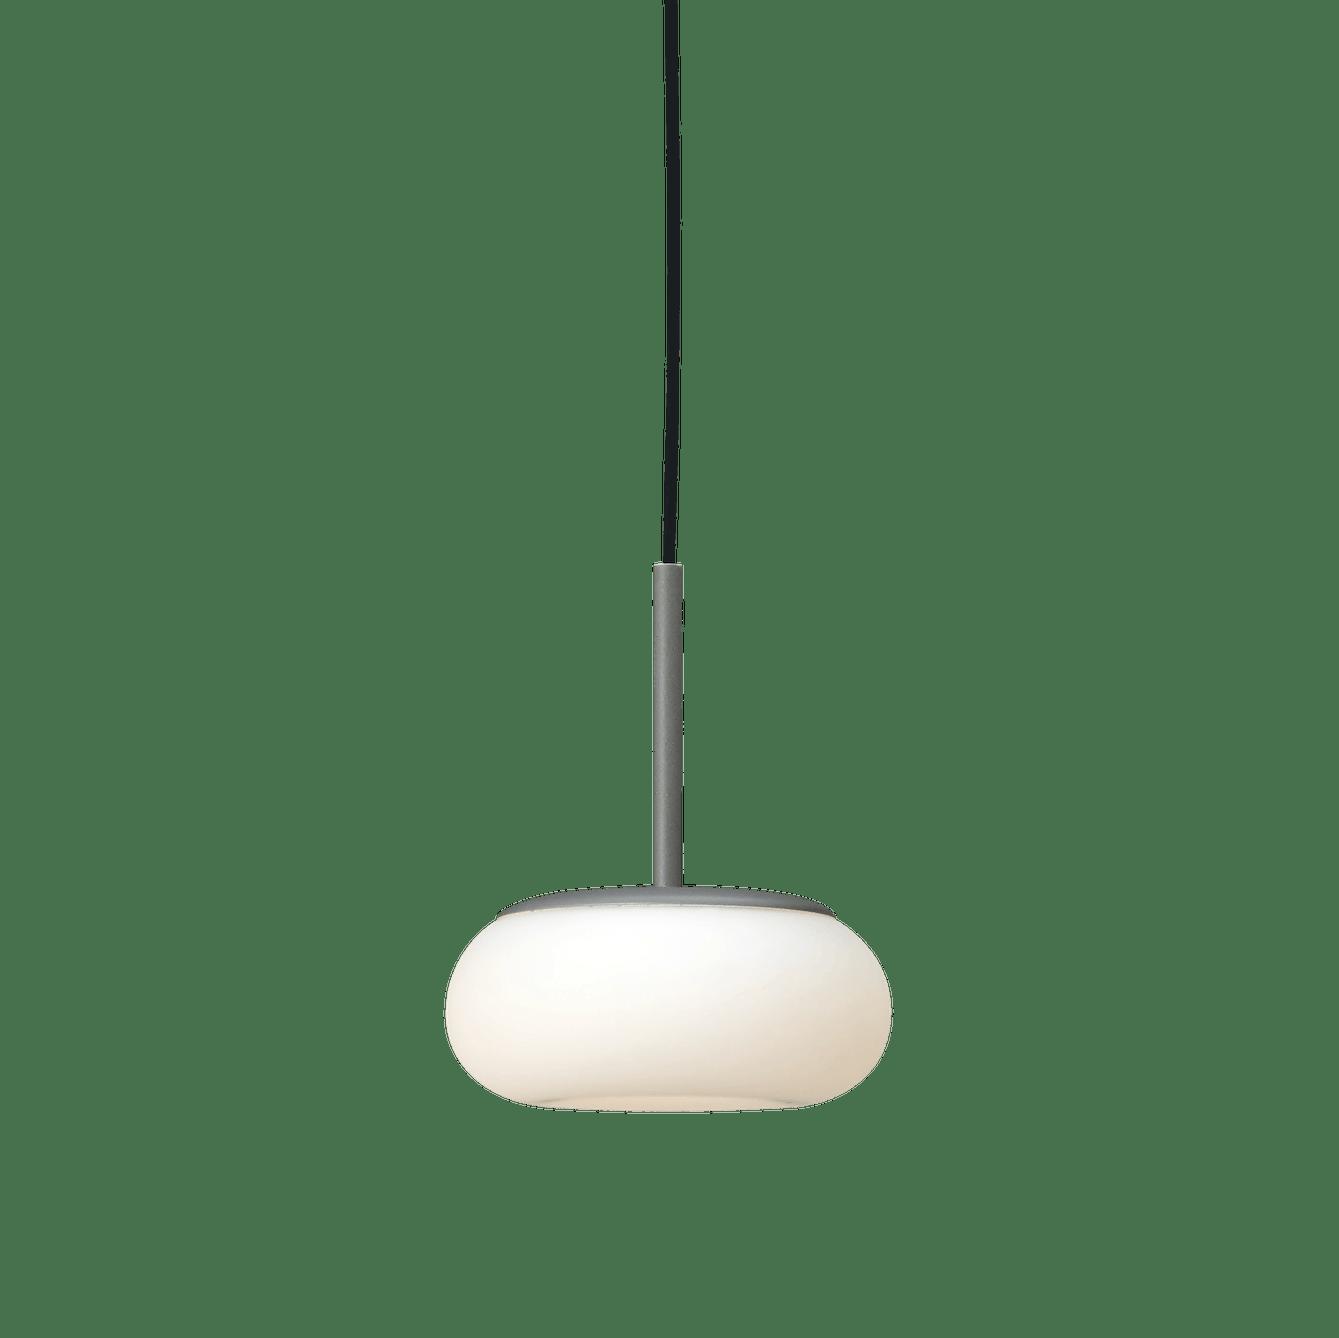 Ago lighting small mozzi pendant grey lit haute living